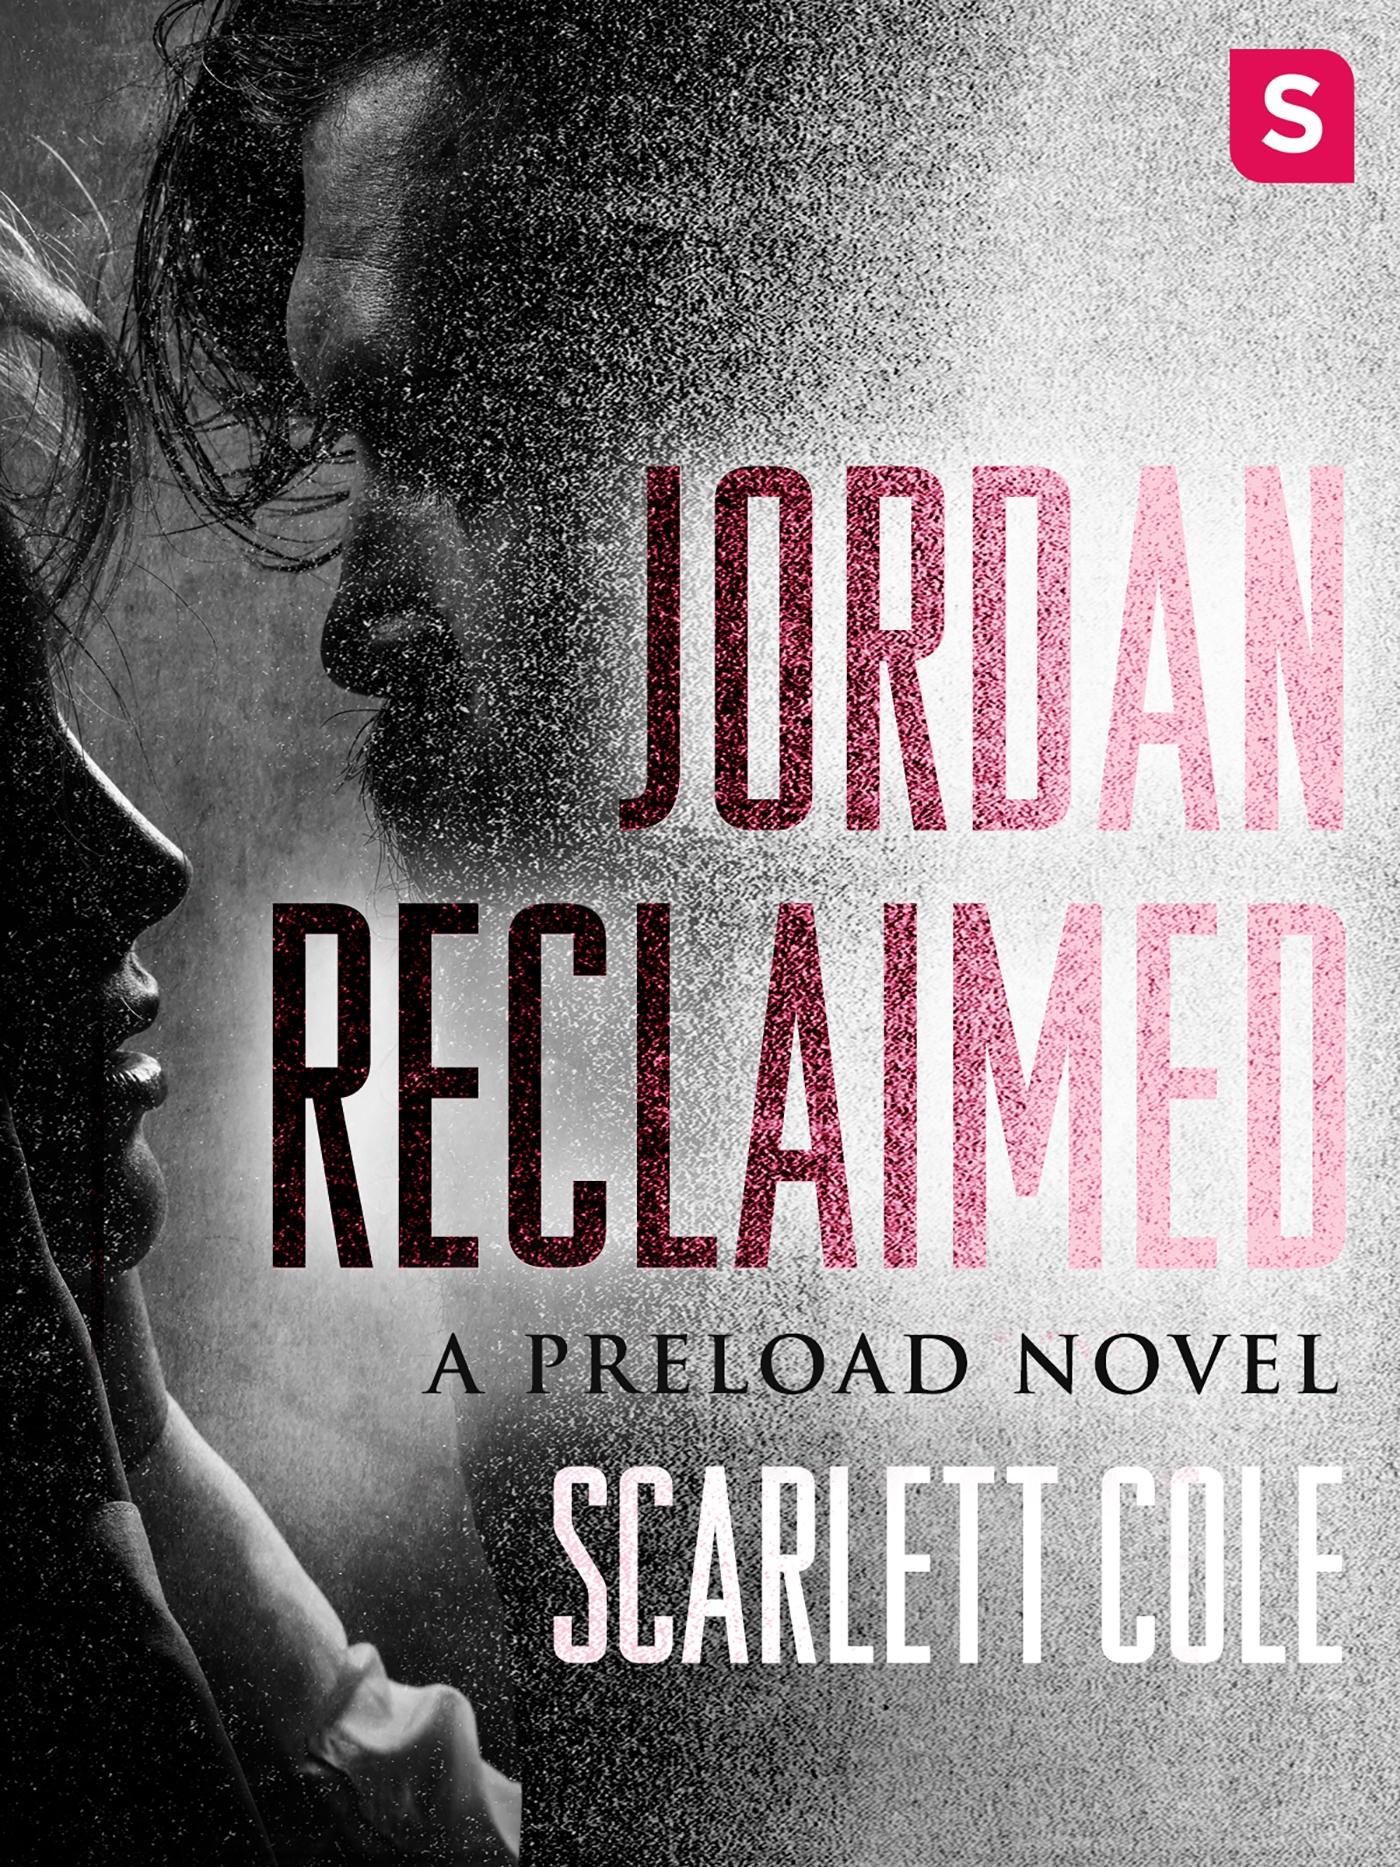 Jordan reclaimed : A Preload Novel